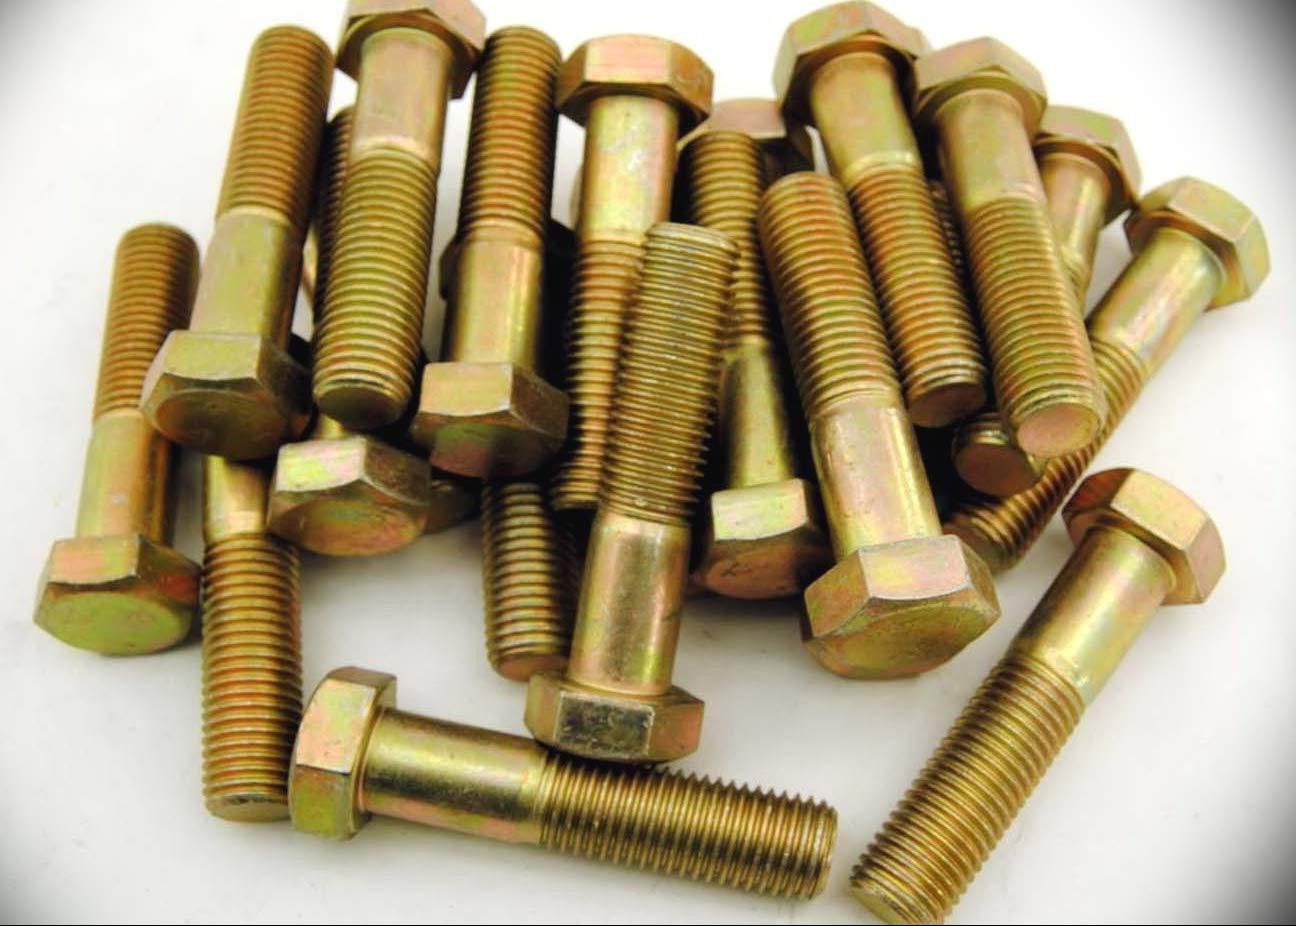 22 PCs Metric Hex Head M16-2 0 x 70 Screws Bolts 16mm Yellow